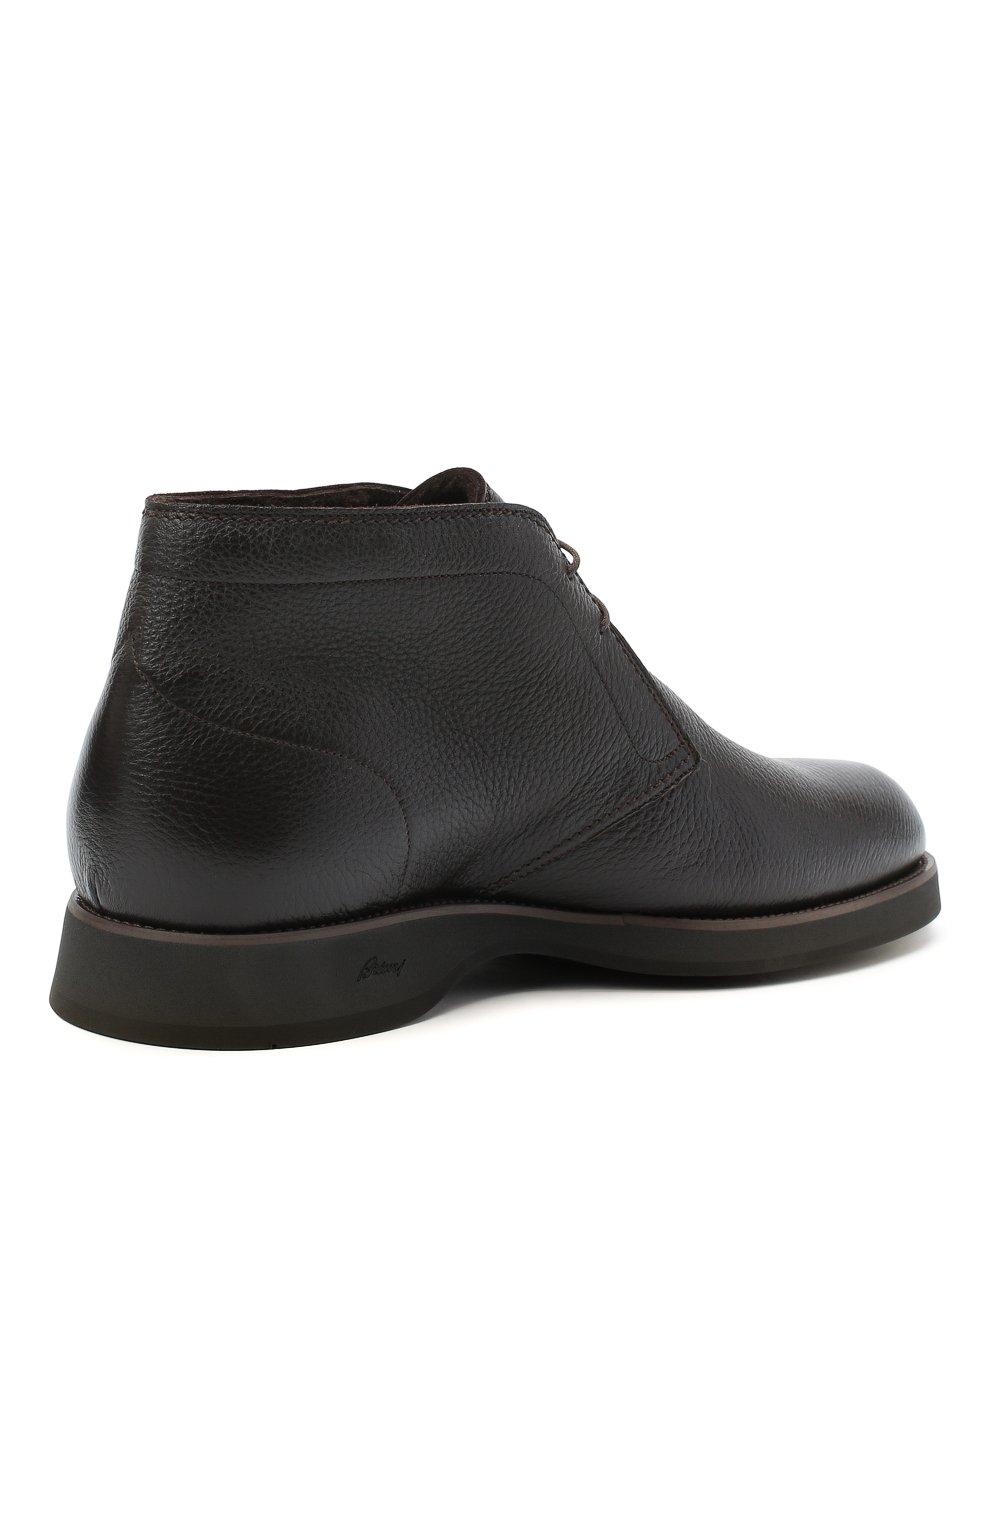 Мужские кожаные ботинки BRIONI темно-коричневого цвета, арт. QQC30L/09712 | Фото 4